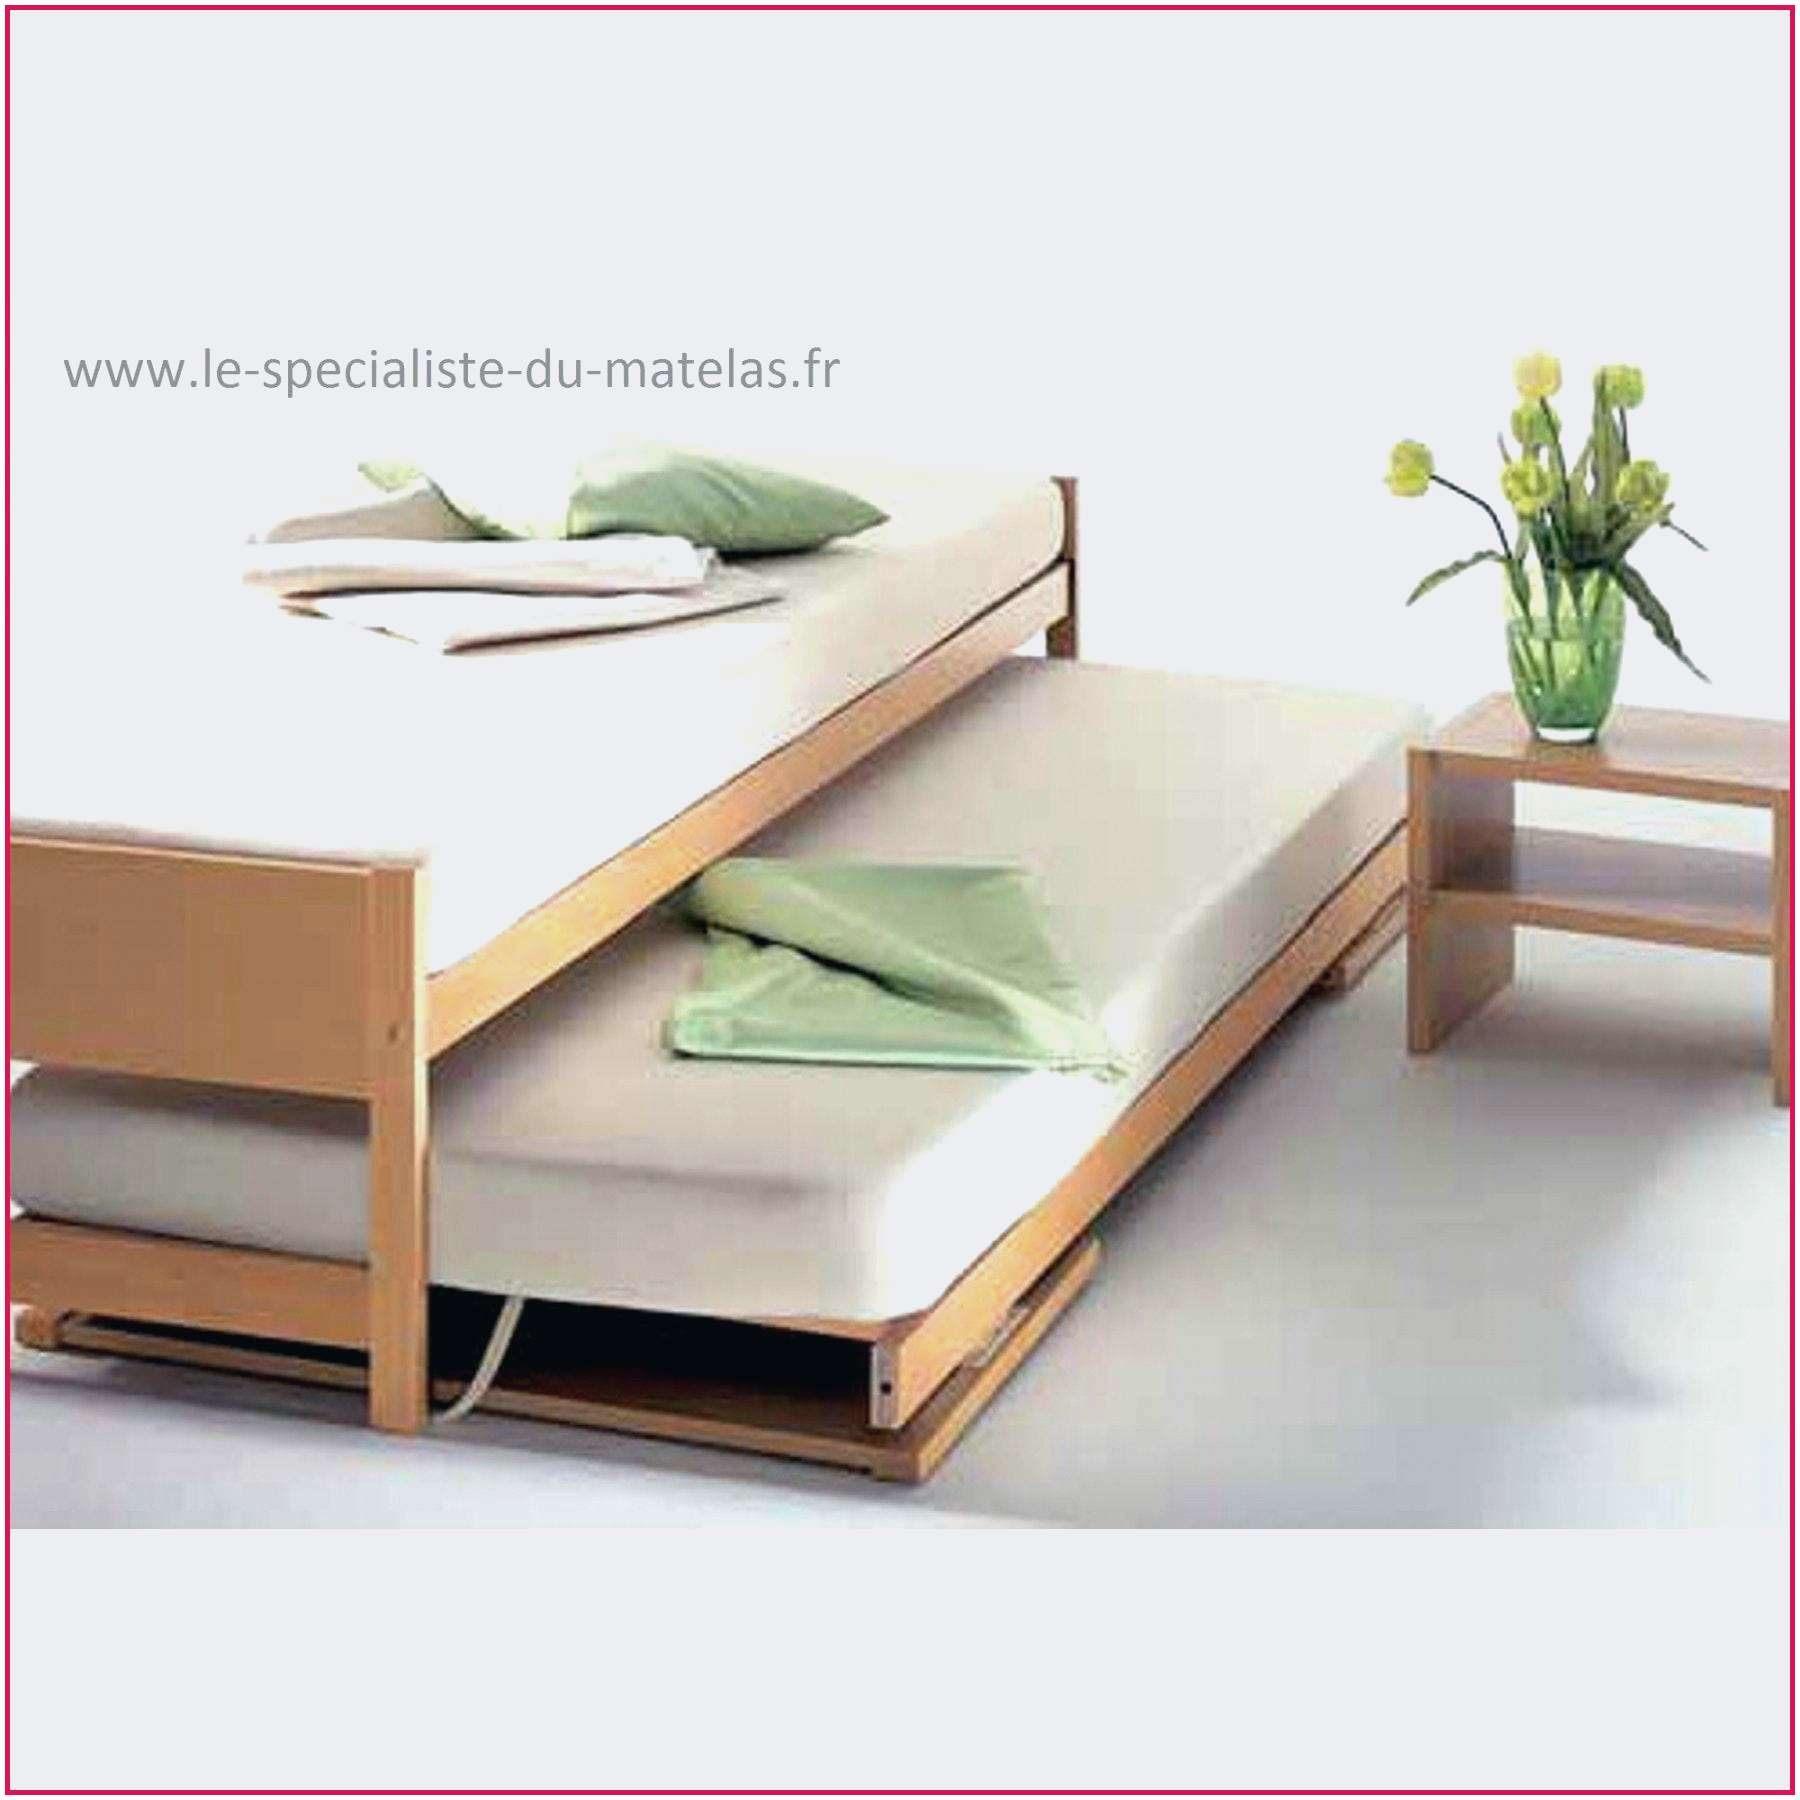 Lit Gigogne Avec Rangement Impressionnant Elégant Lit Gigogne Design Unique Bedroom Design Divine Bedroom Full